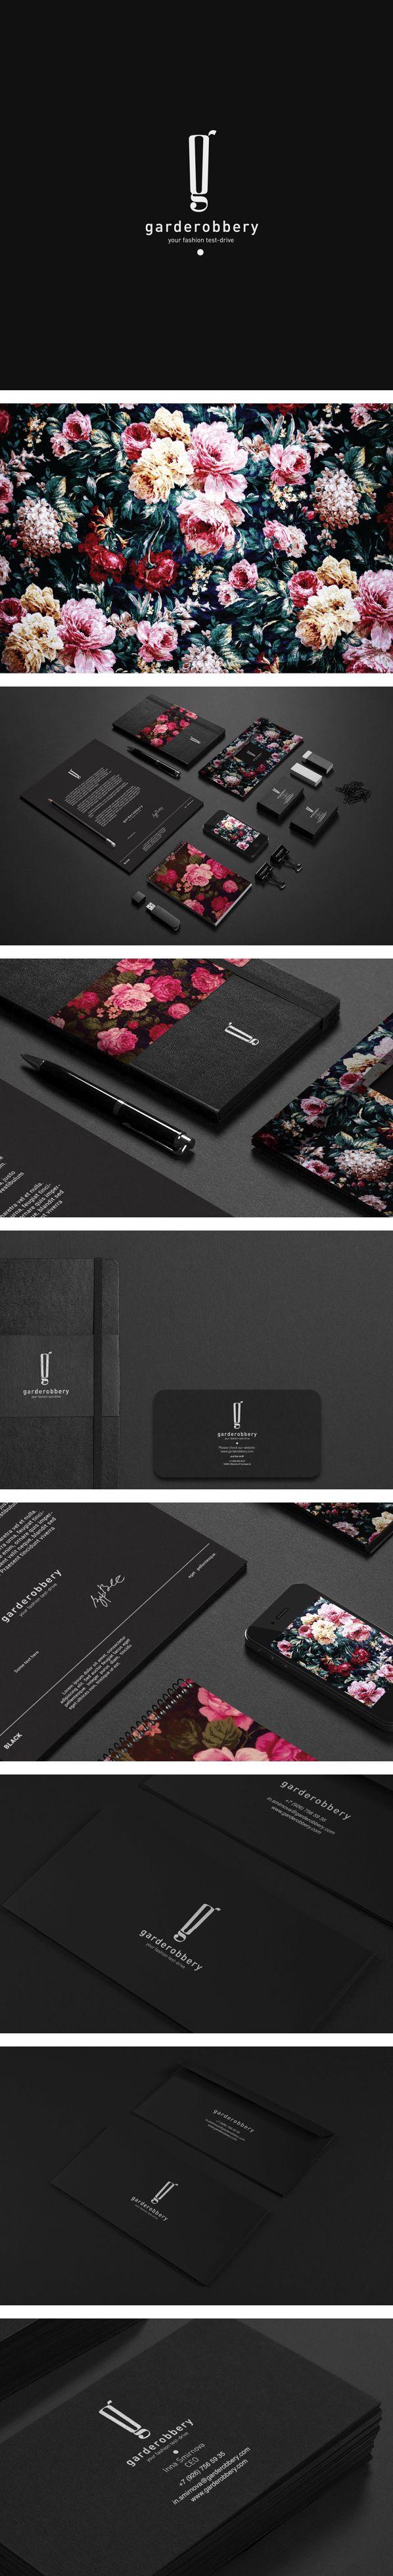 #logo #brand #branding #identity #design